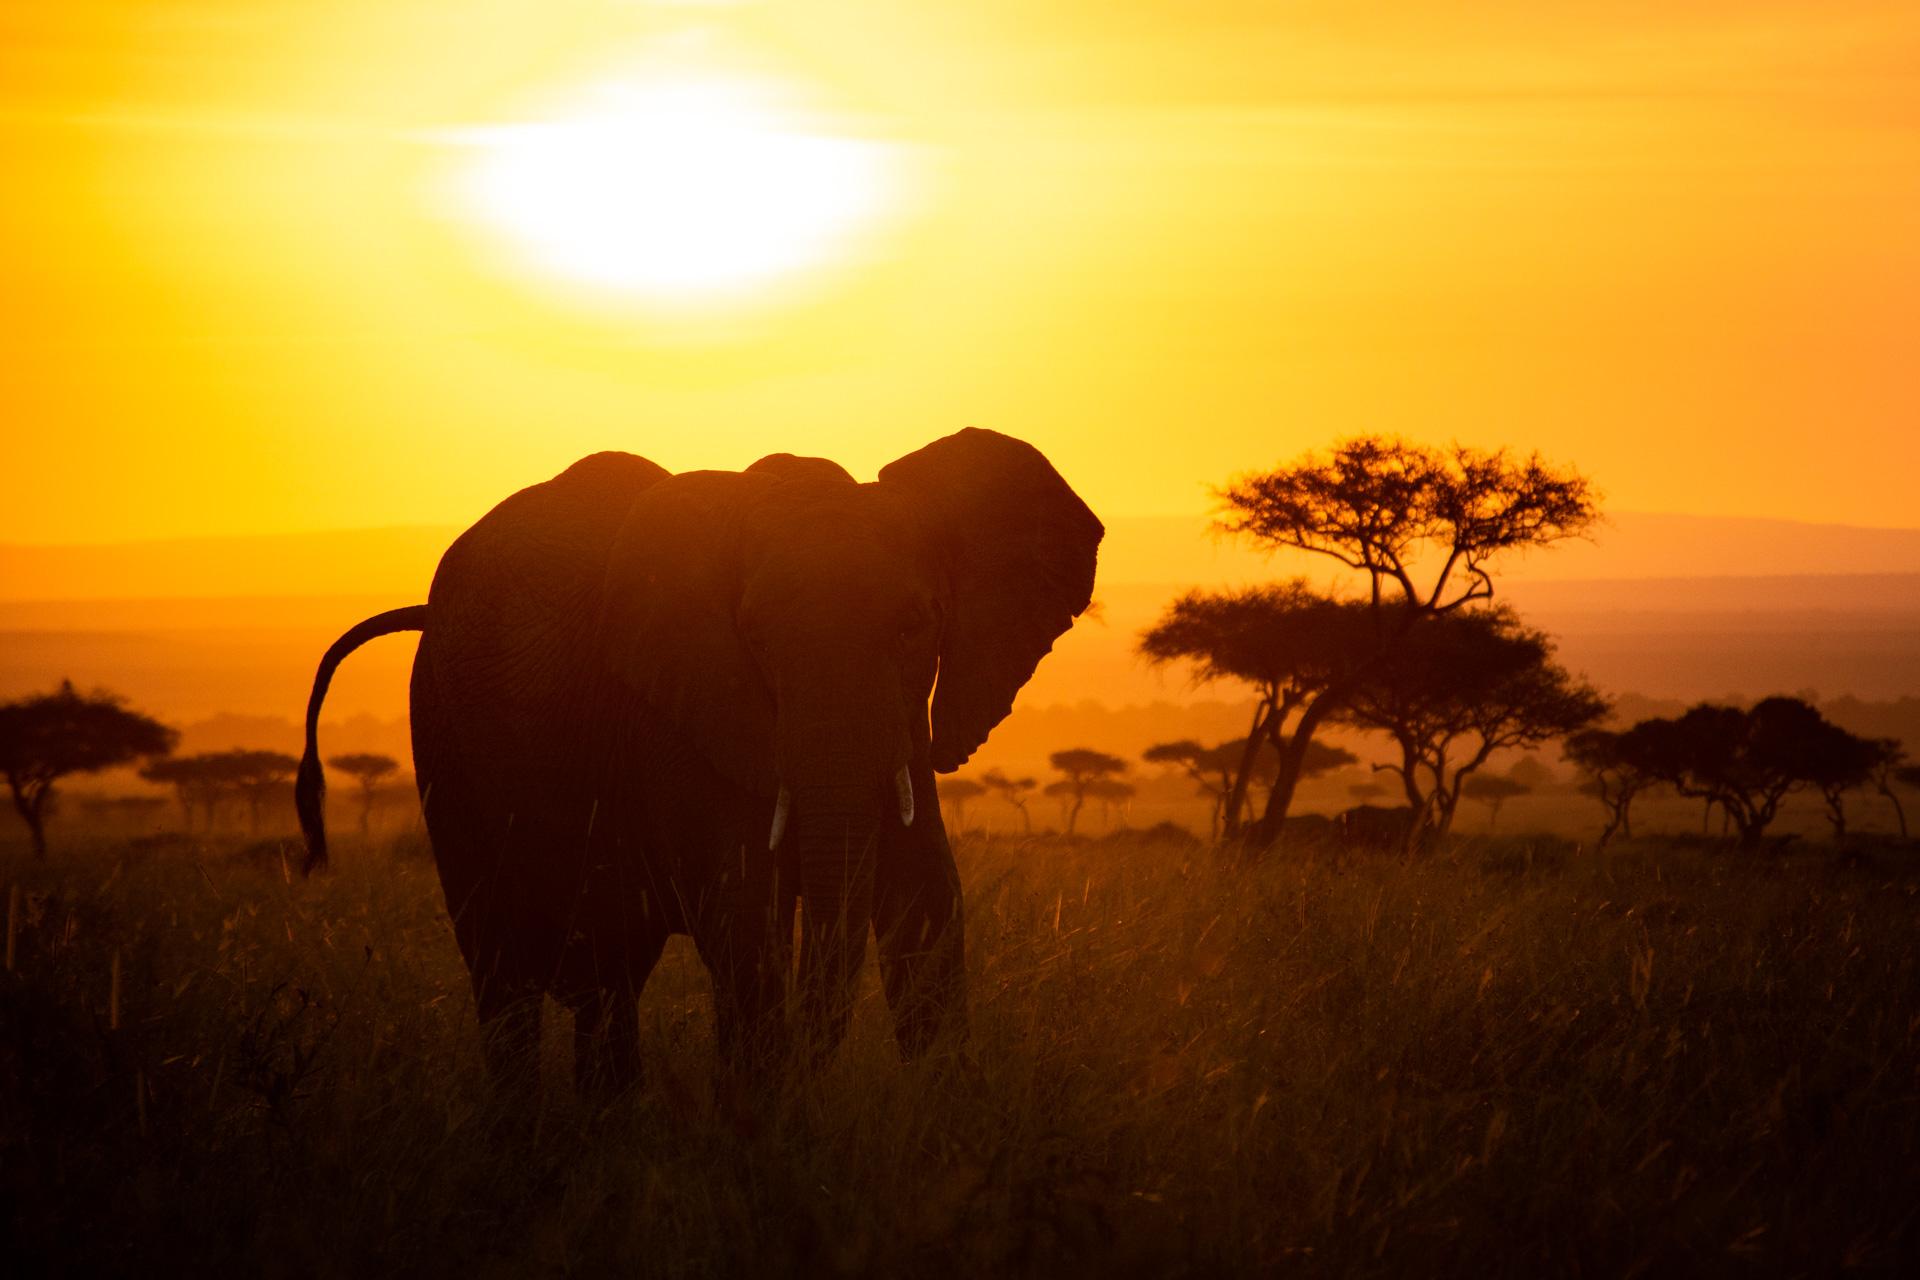 More elephants at sunrise